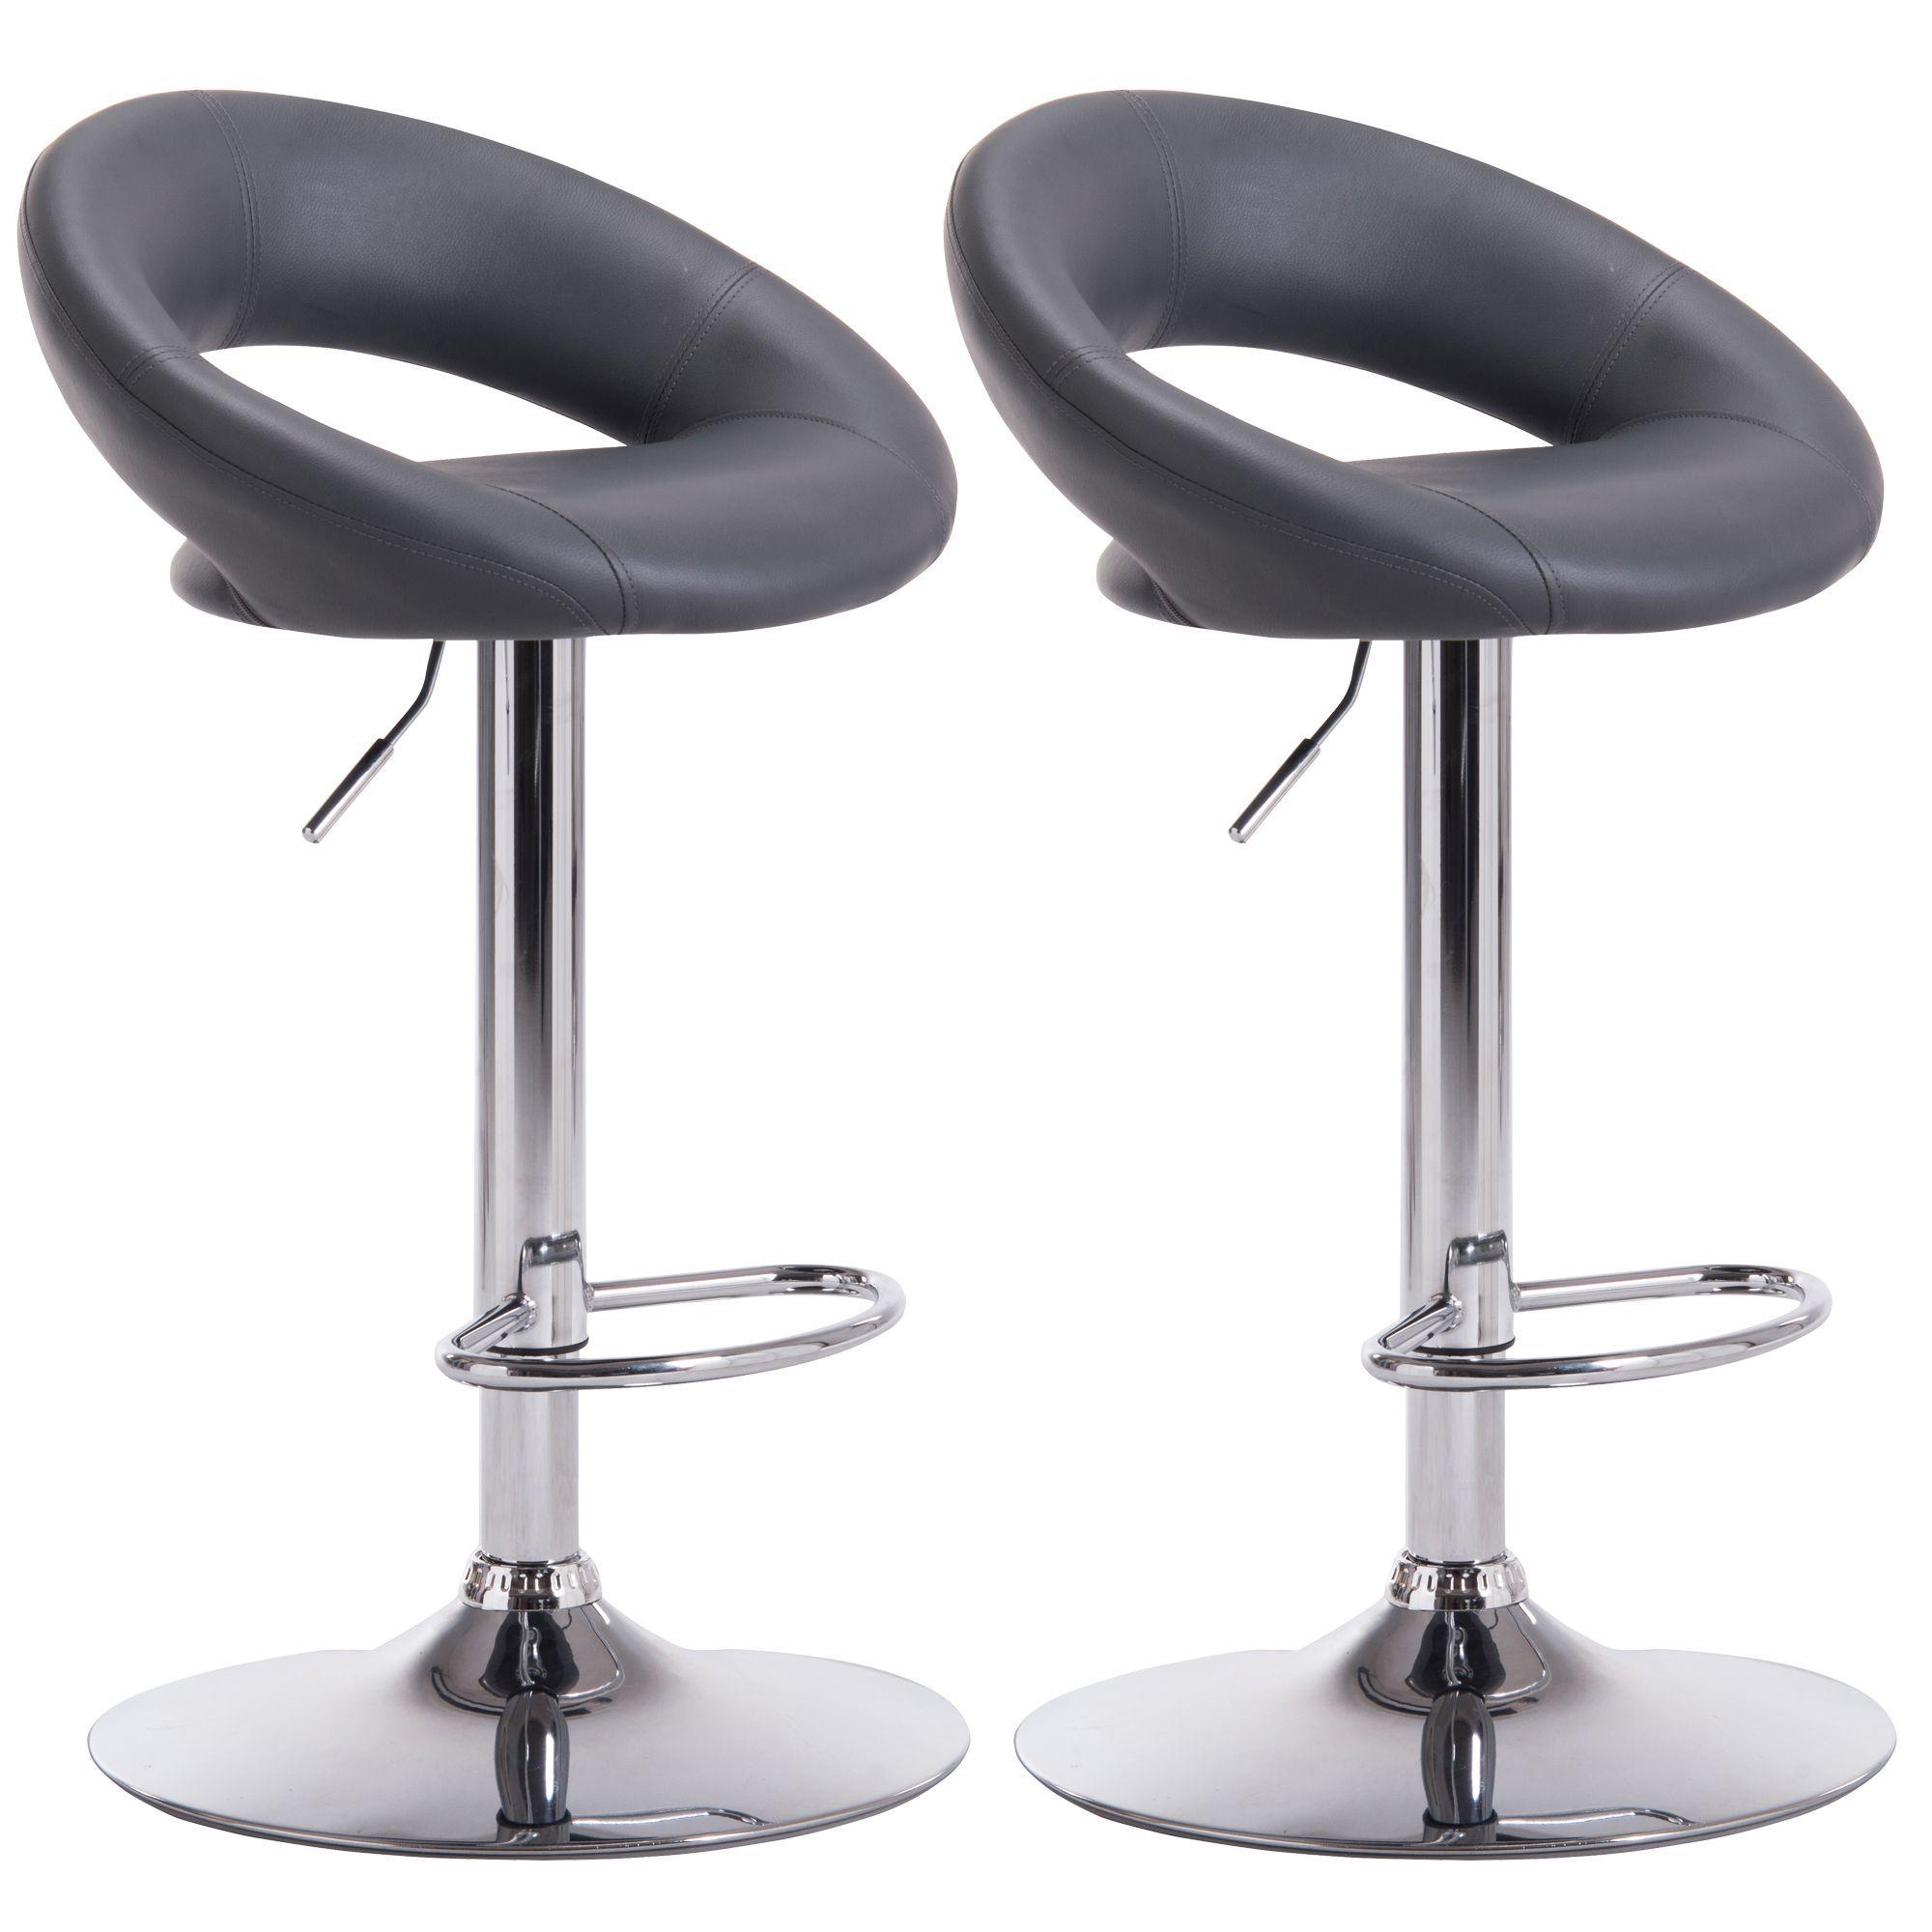 sale retailer cacbe 2cf36 Regina Grey & Chrome effect Bar stool (H)1000mm (W)490mm, Pack of 2    Departments   DIY at B&Q